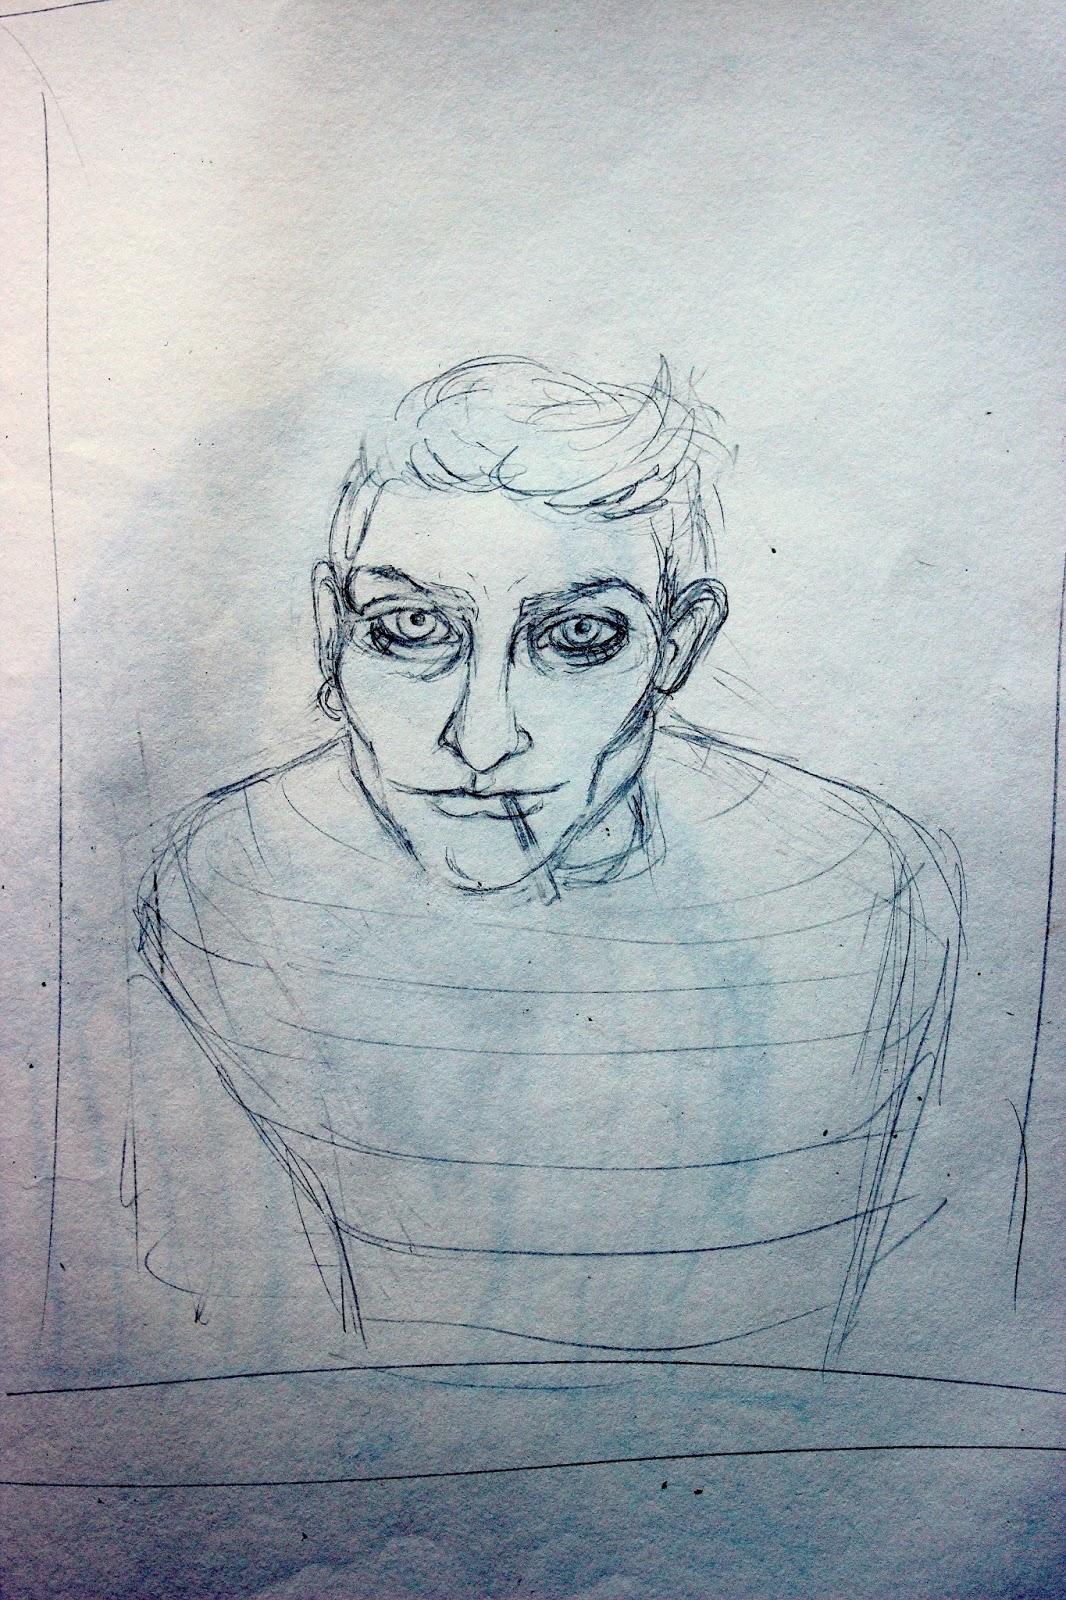 Sketchpad Notebook Sketch Drawing Pencil Portrait Smoking Man